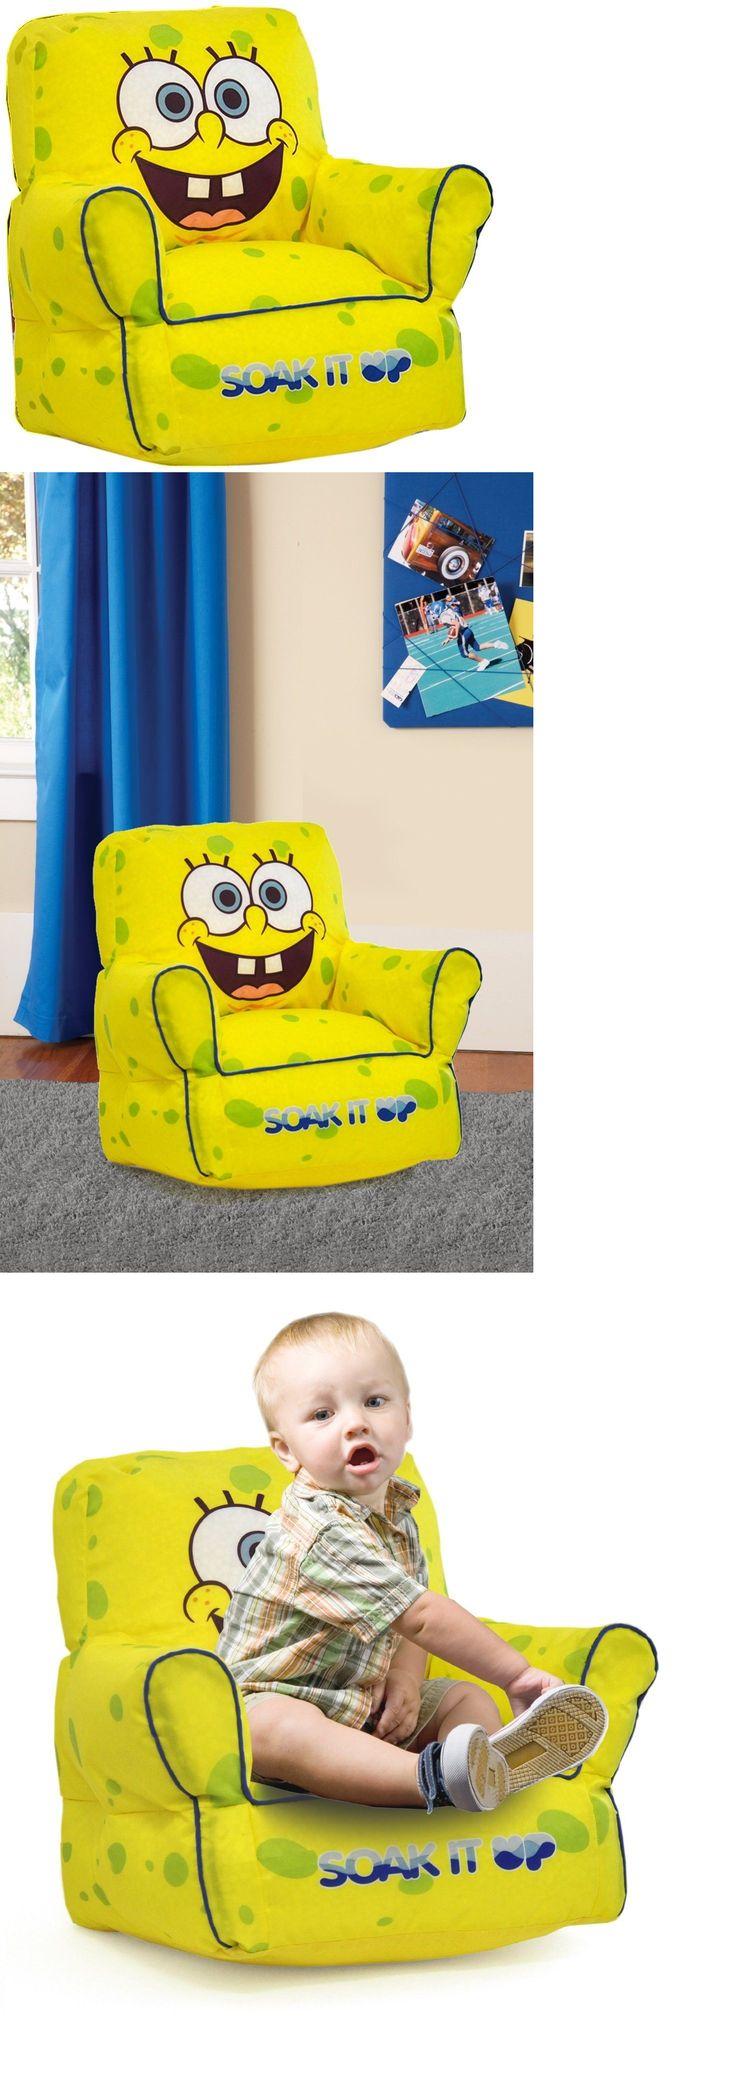 SpongeBob Squarepants 20919: Bean Bag Chair Dorm Kids Seat Furniture Sofa Tv Video Games Room Lounge Spongebo -> BUY IT NOW ONLY: $36.93 on eBay!